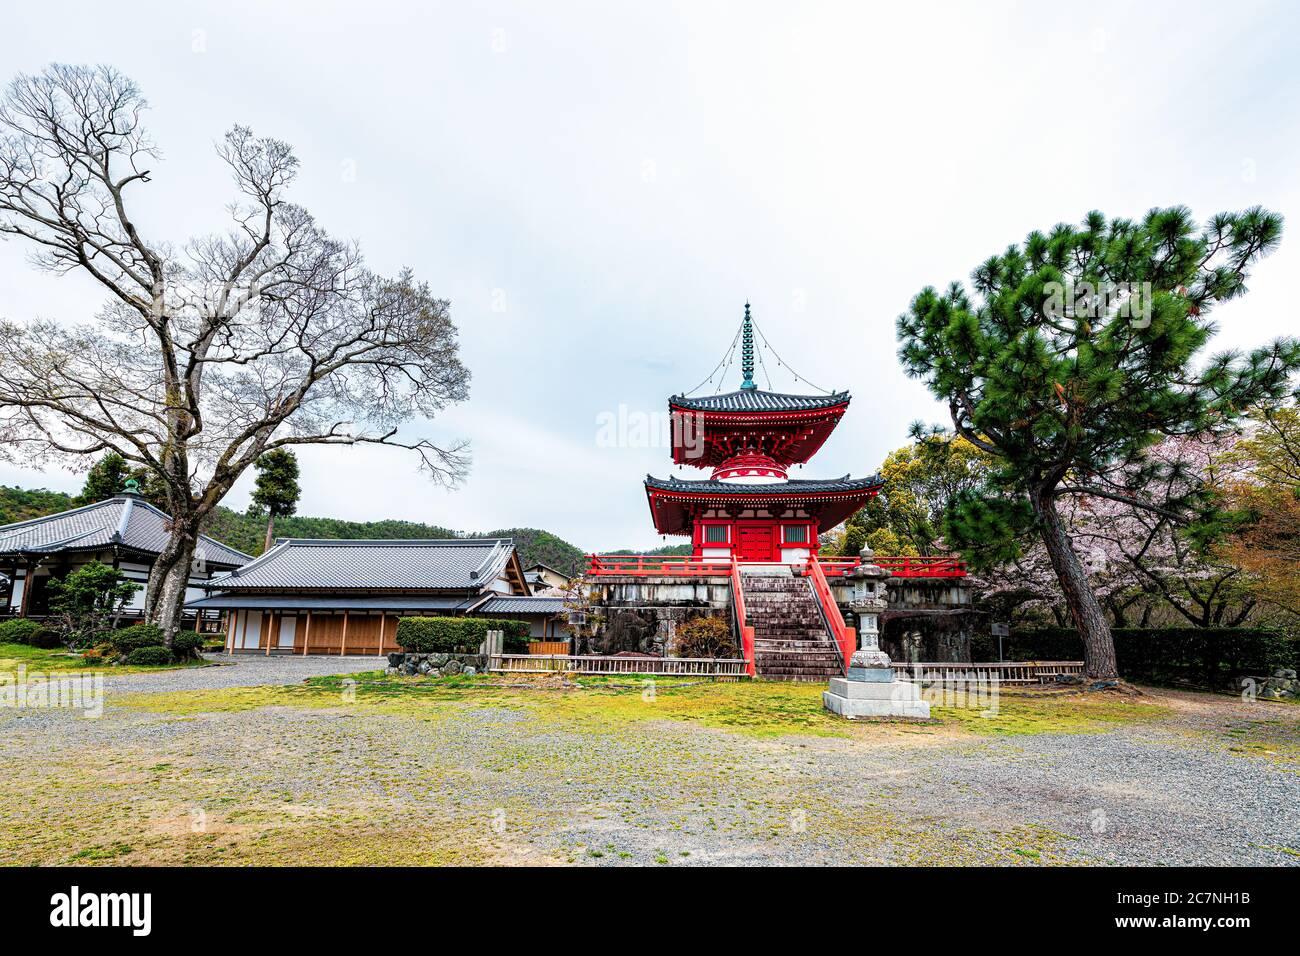 Kyoto, Japan - April 12, 2019: Cherry blossom sakura trees flowers in garden park grounds of Shingyo-Hoto Tower pagoda building in Daikakuji temple Stock Photo